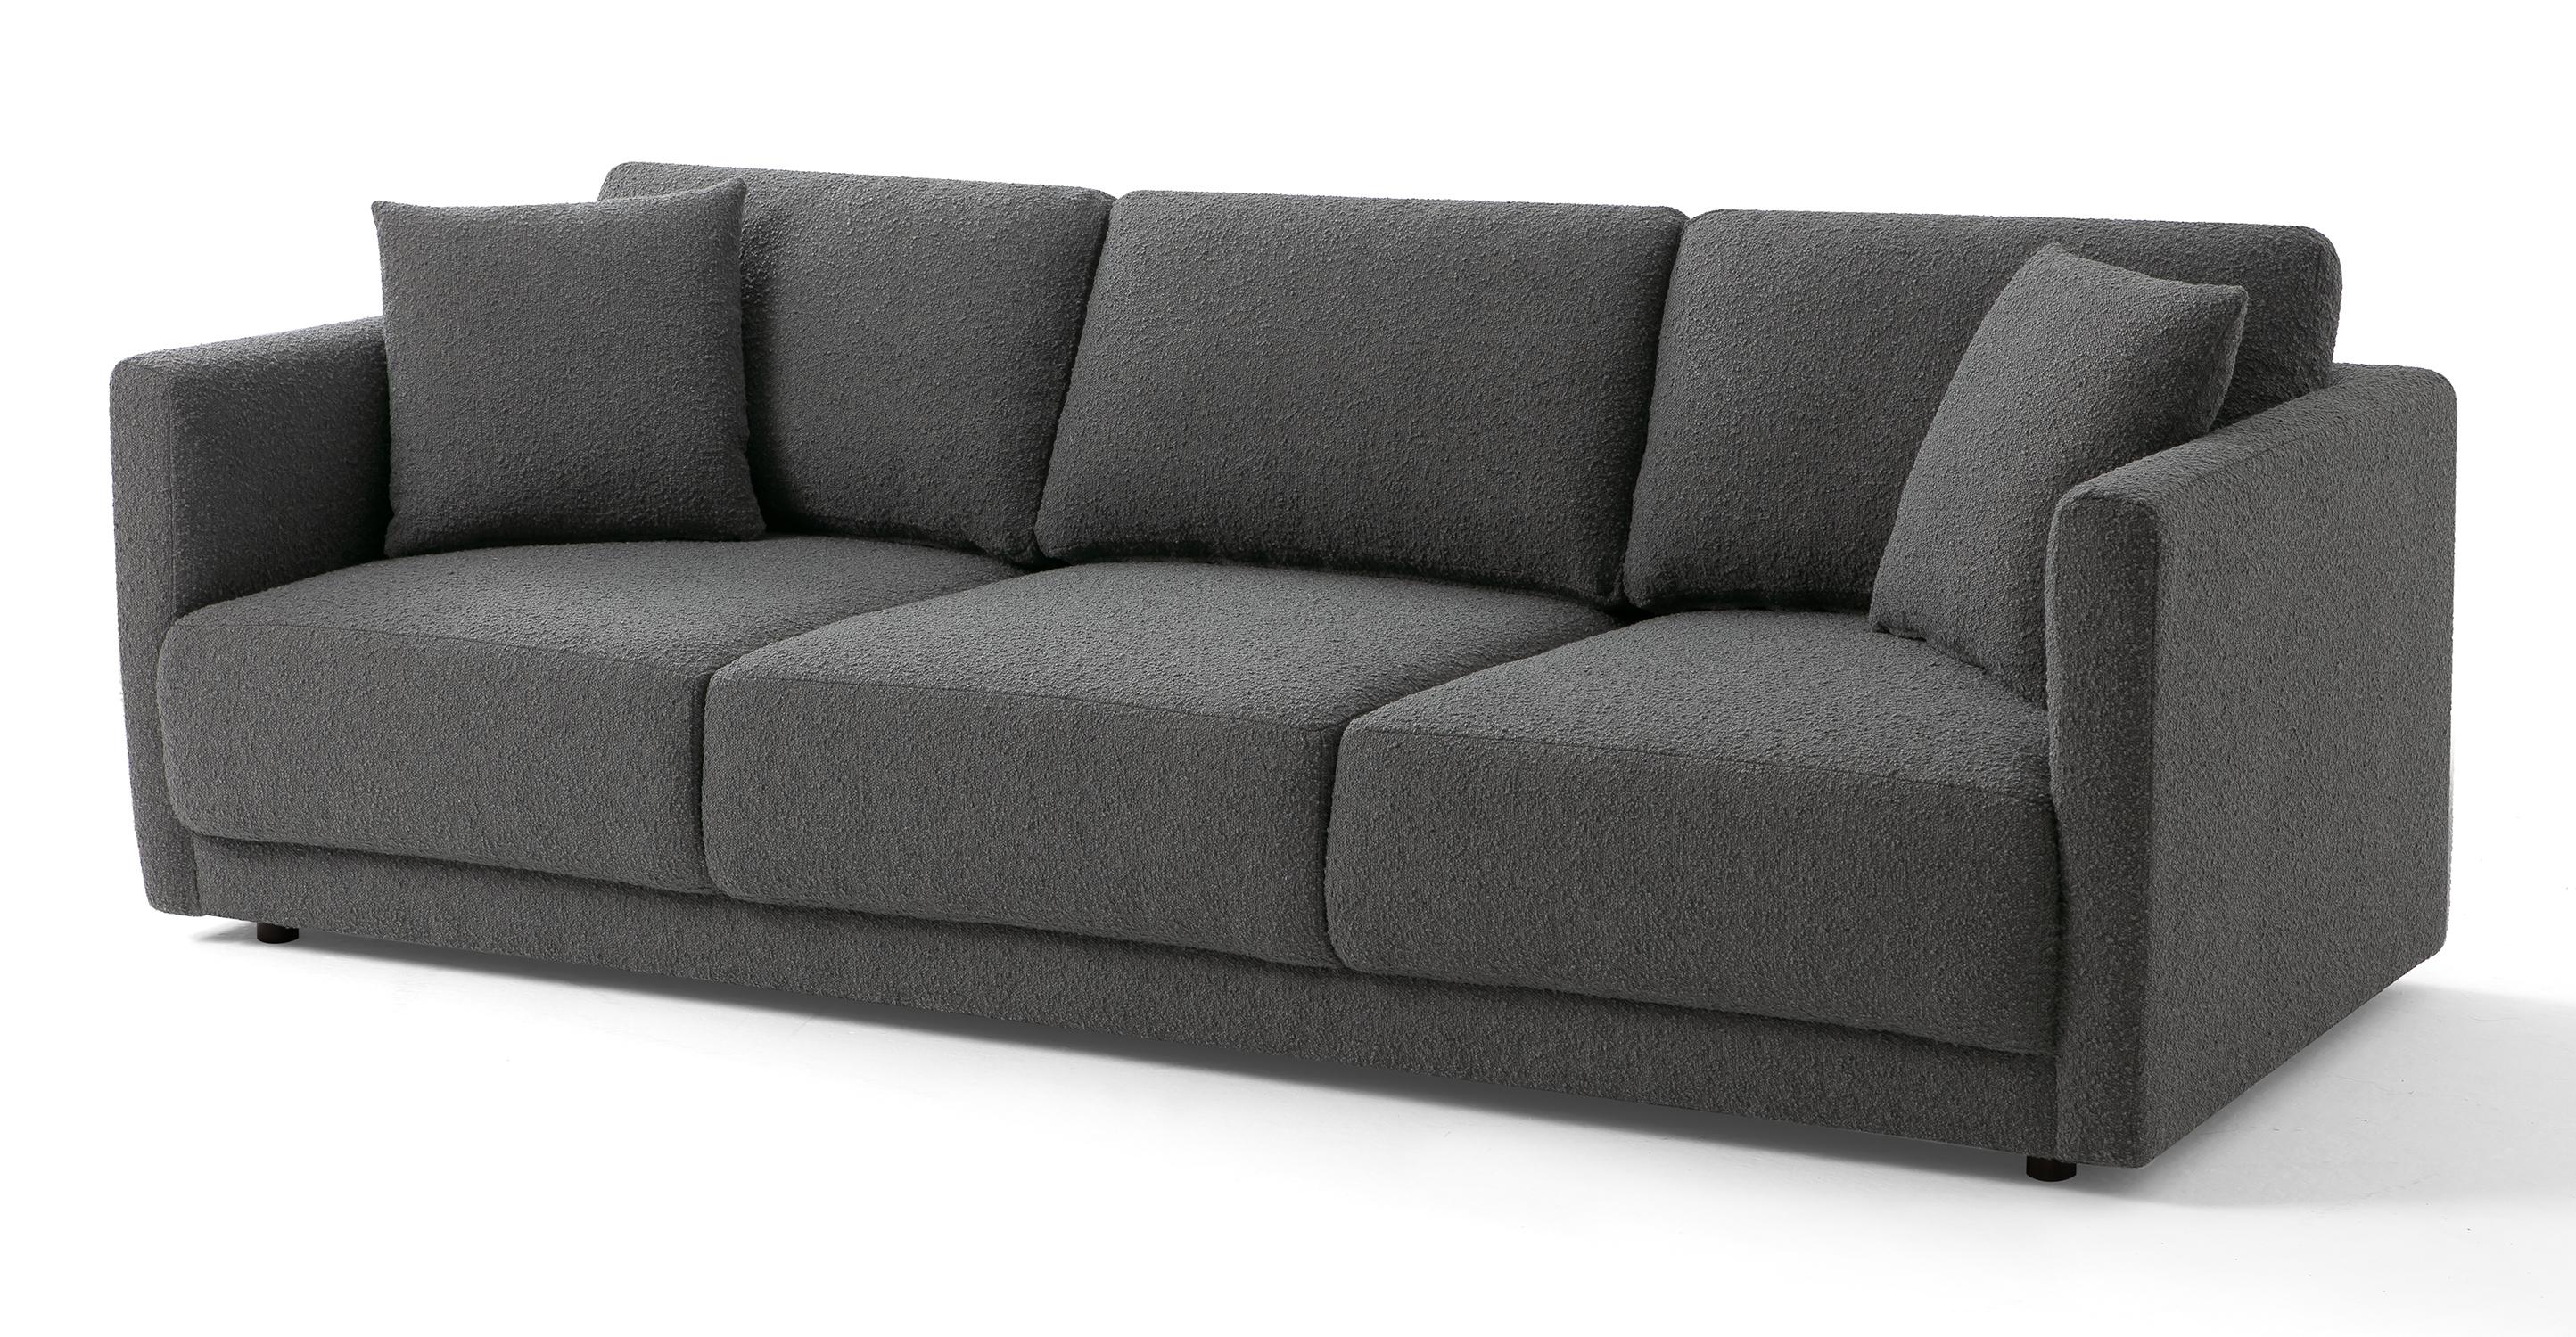 "Domus 93"" Fabric Sofa, Gris Boucle"